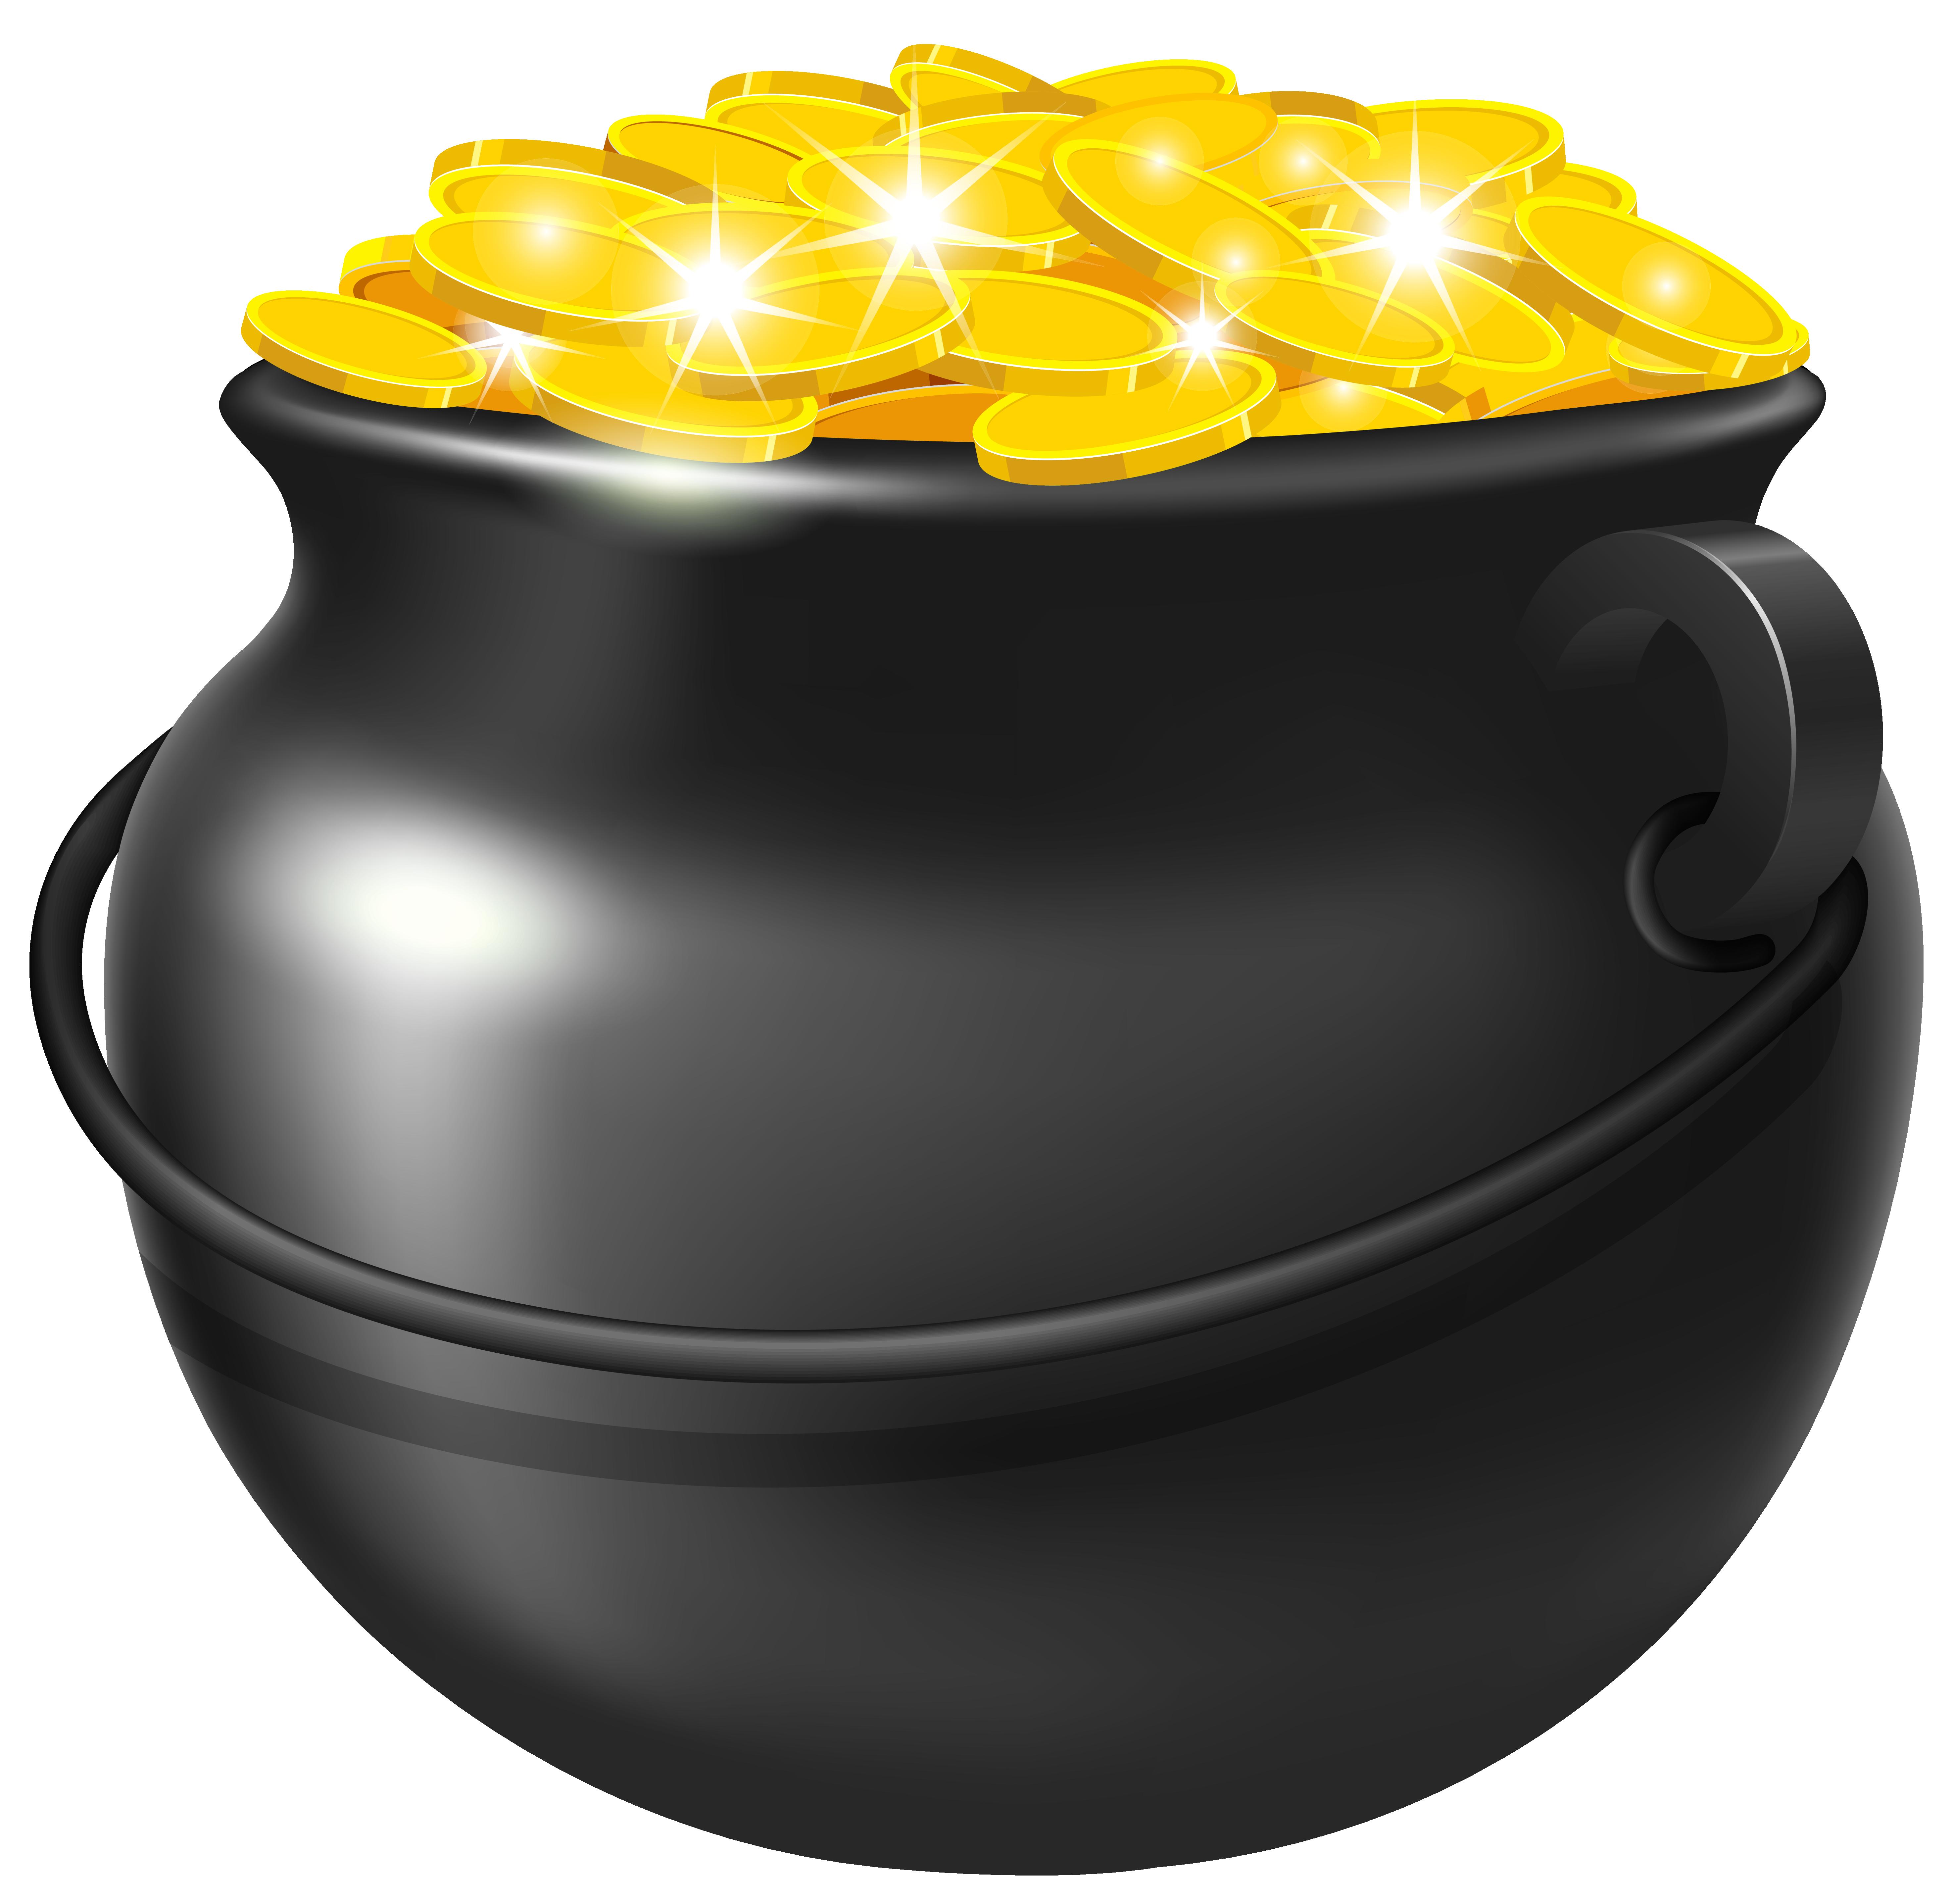 Black Pot Of Gold Png Clipart Image St Patricks Day Clipart Pot Of Gold Pot Of Gold Image